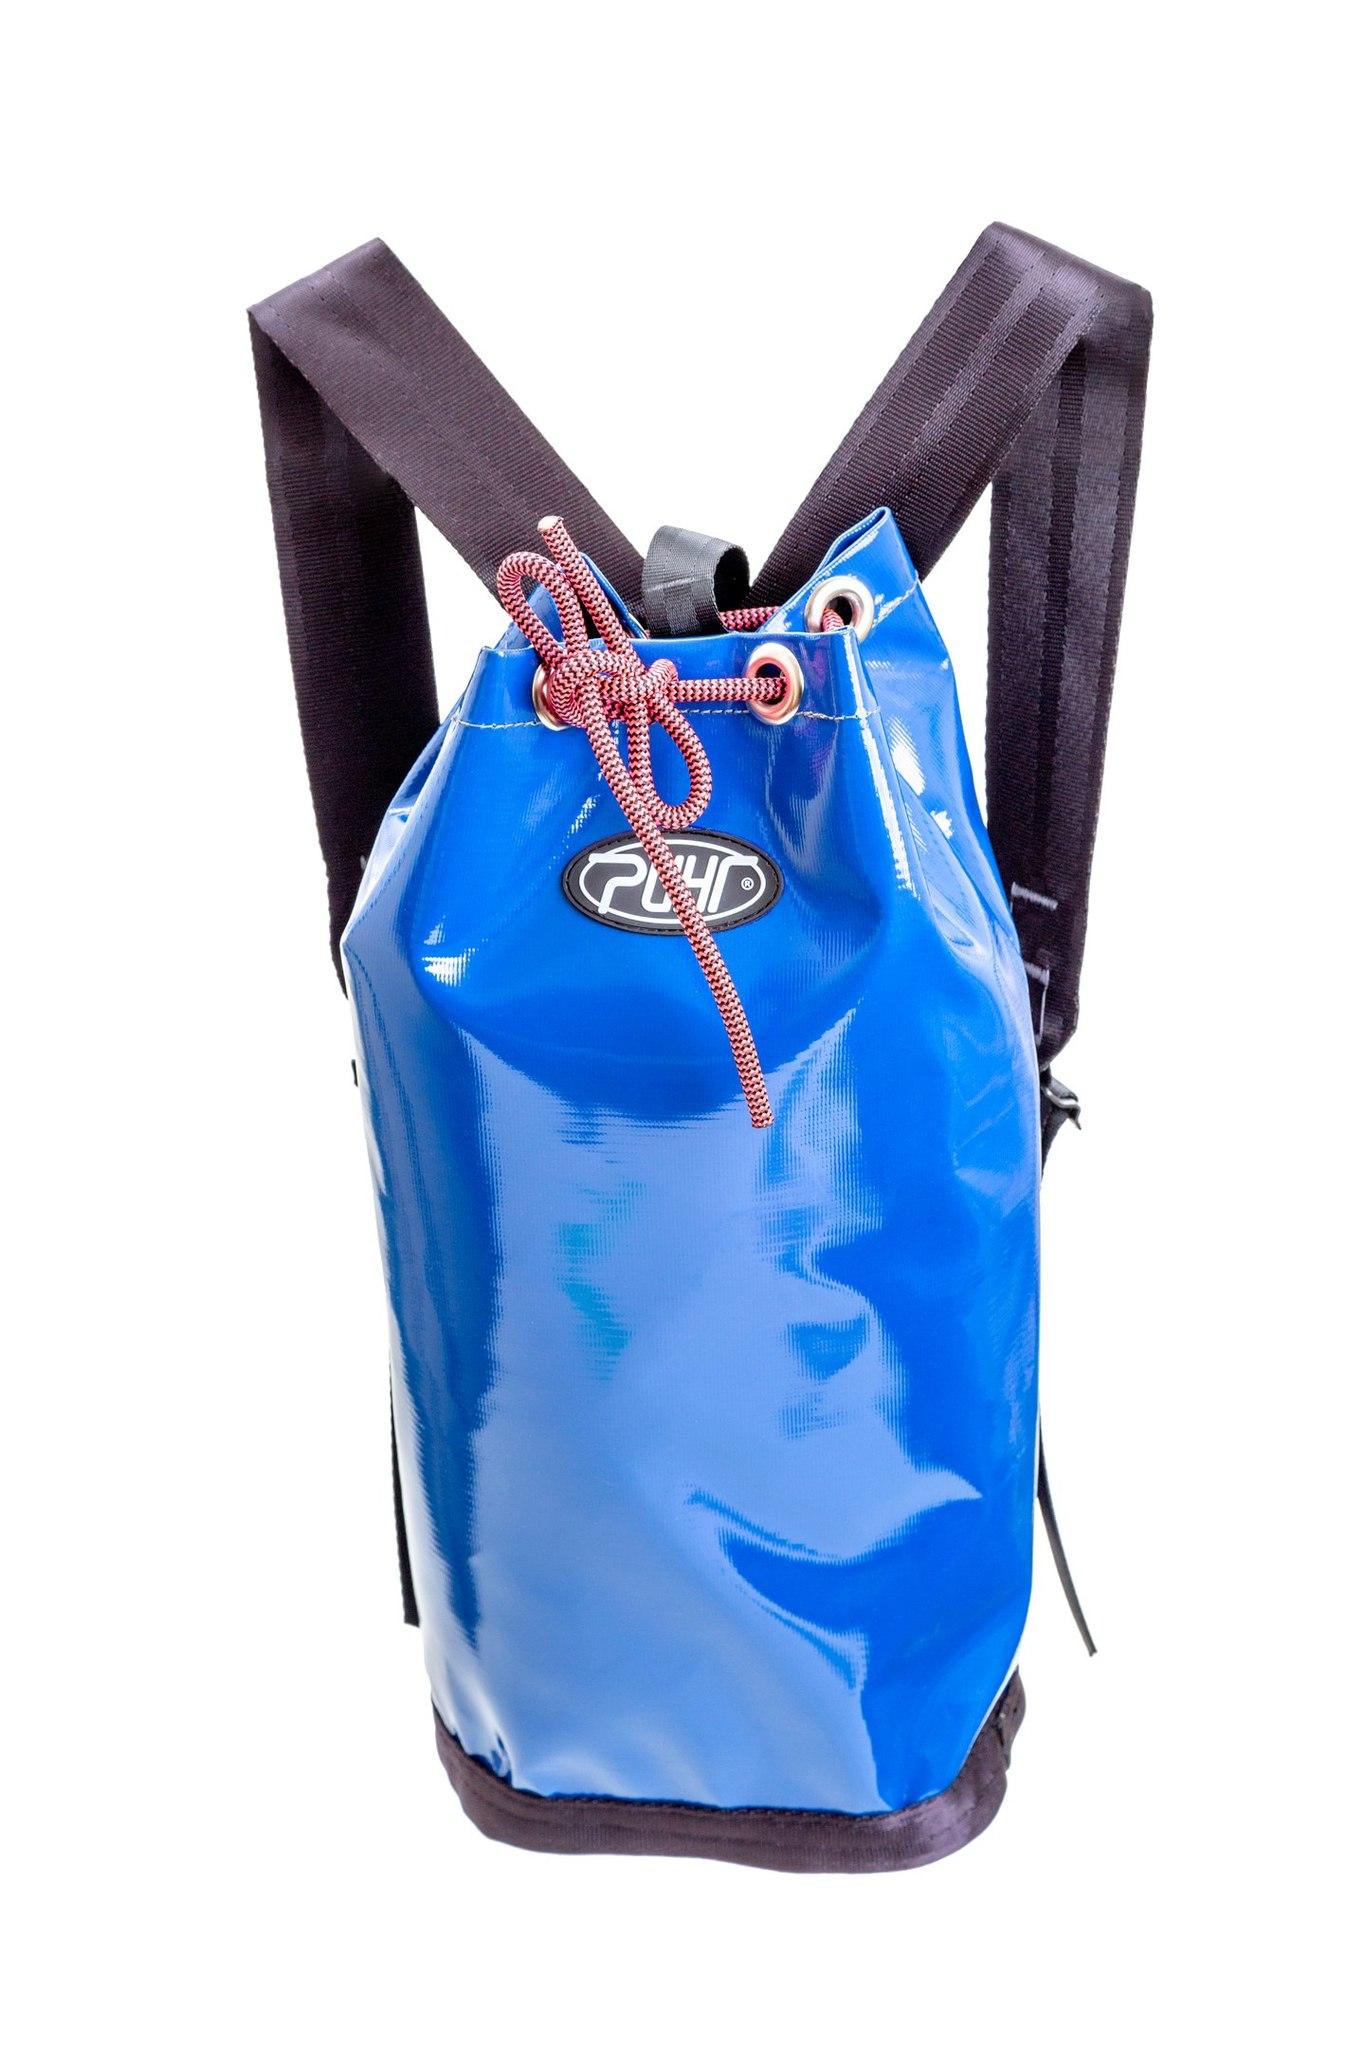 Транспортный мешок TransBaggi 12 л